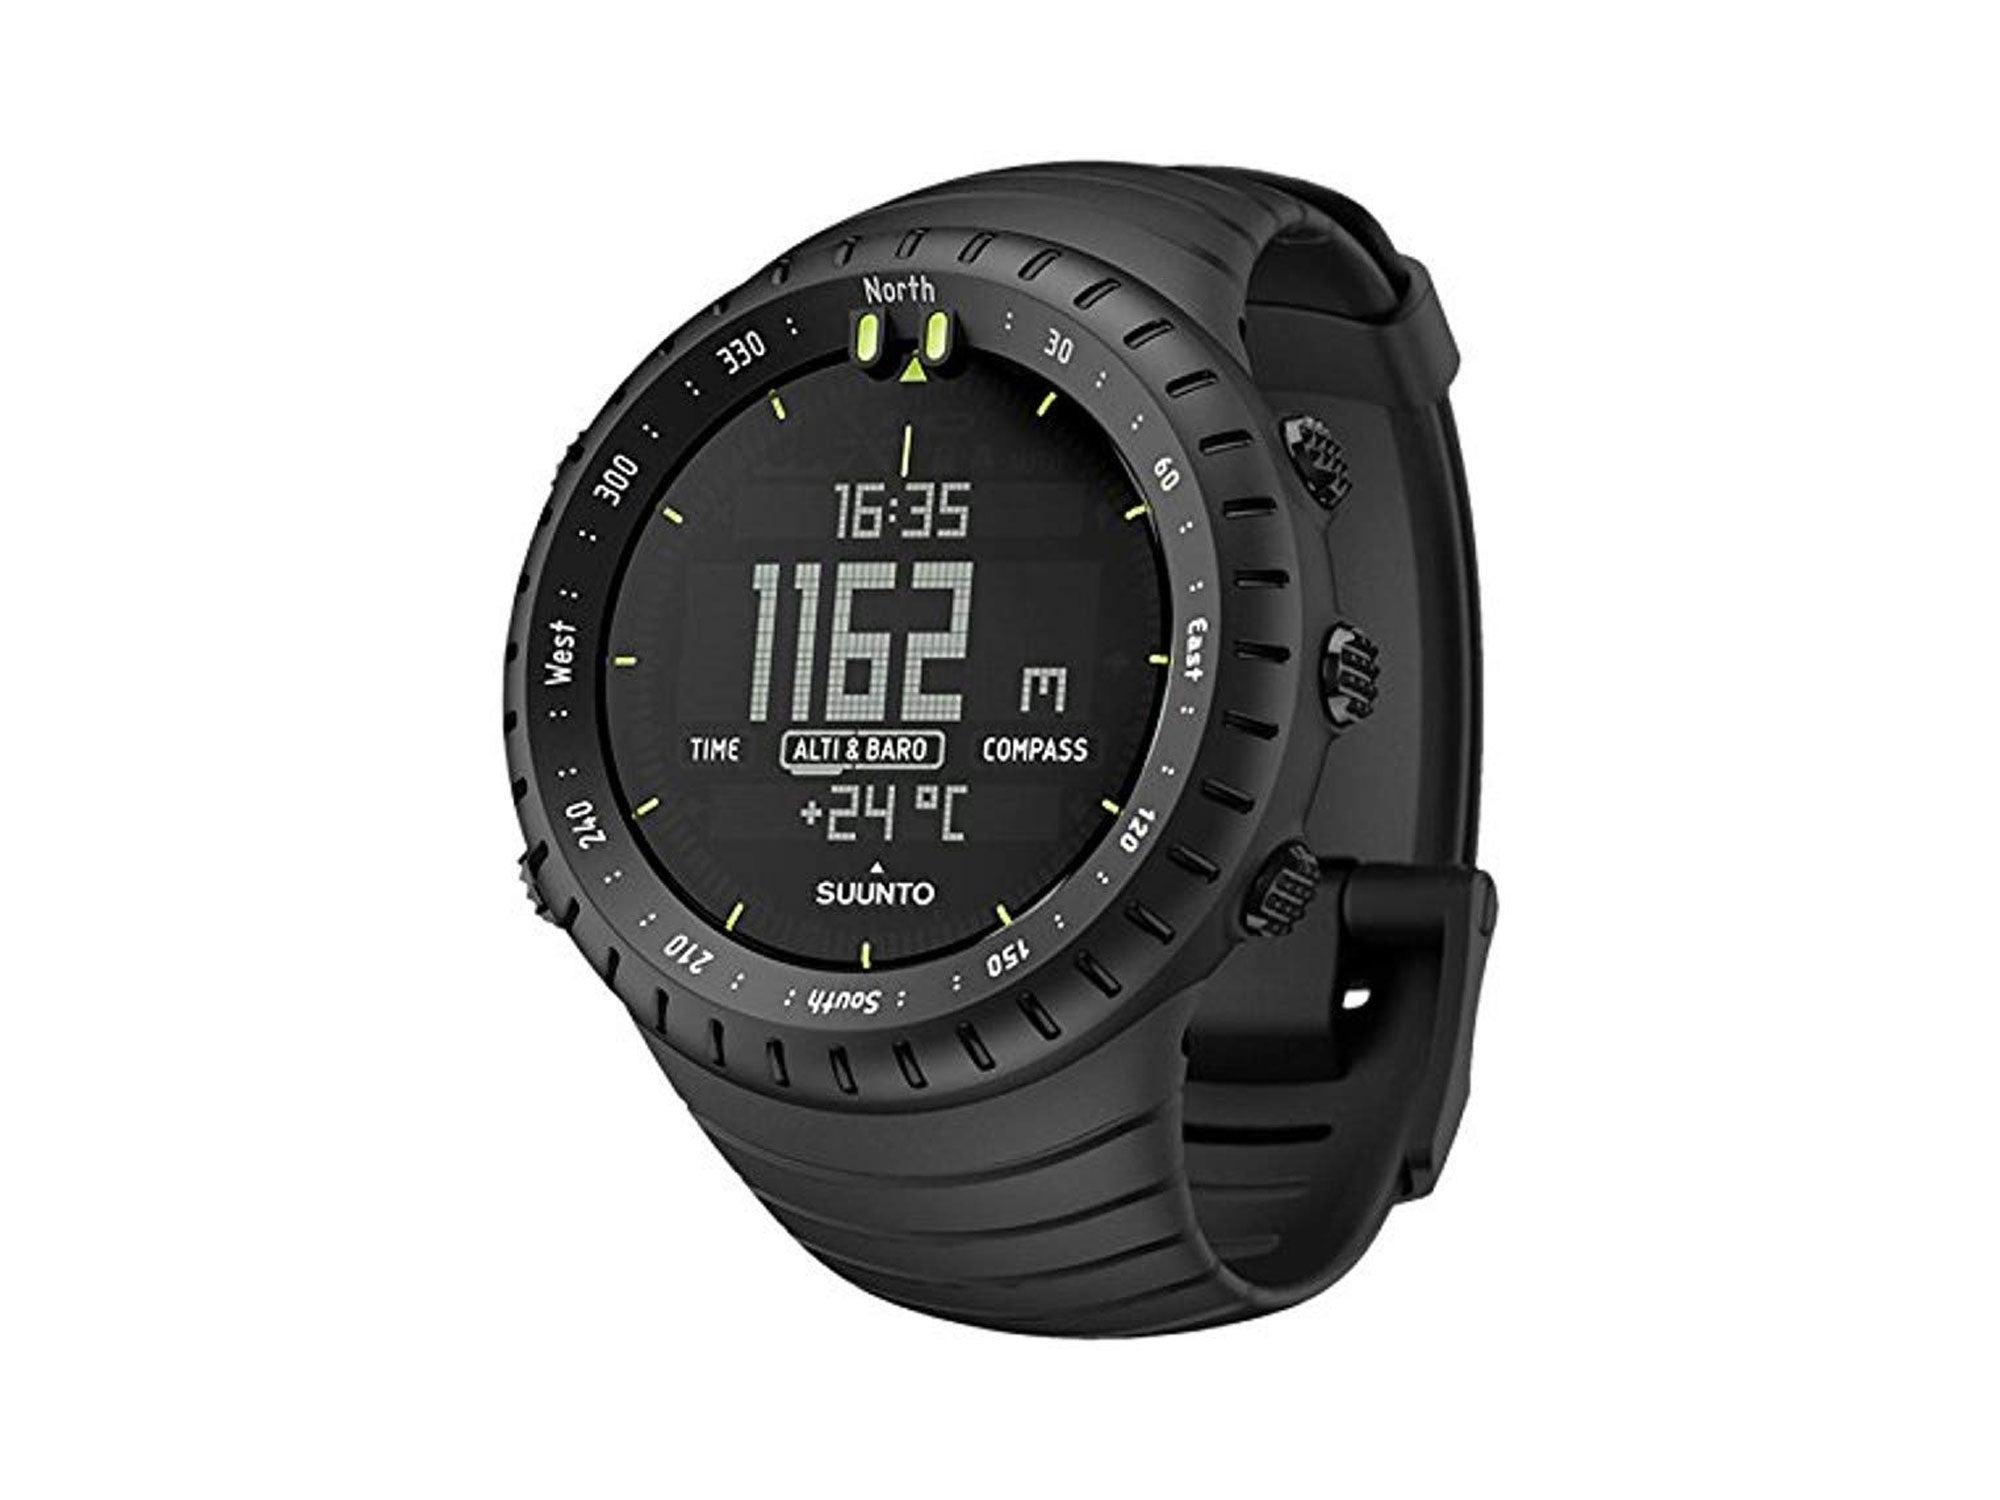 Suunto black military watch